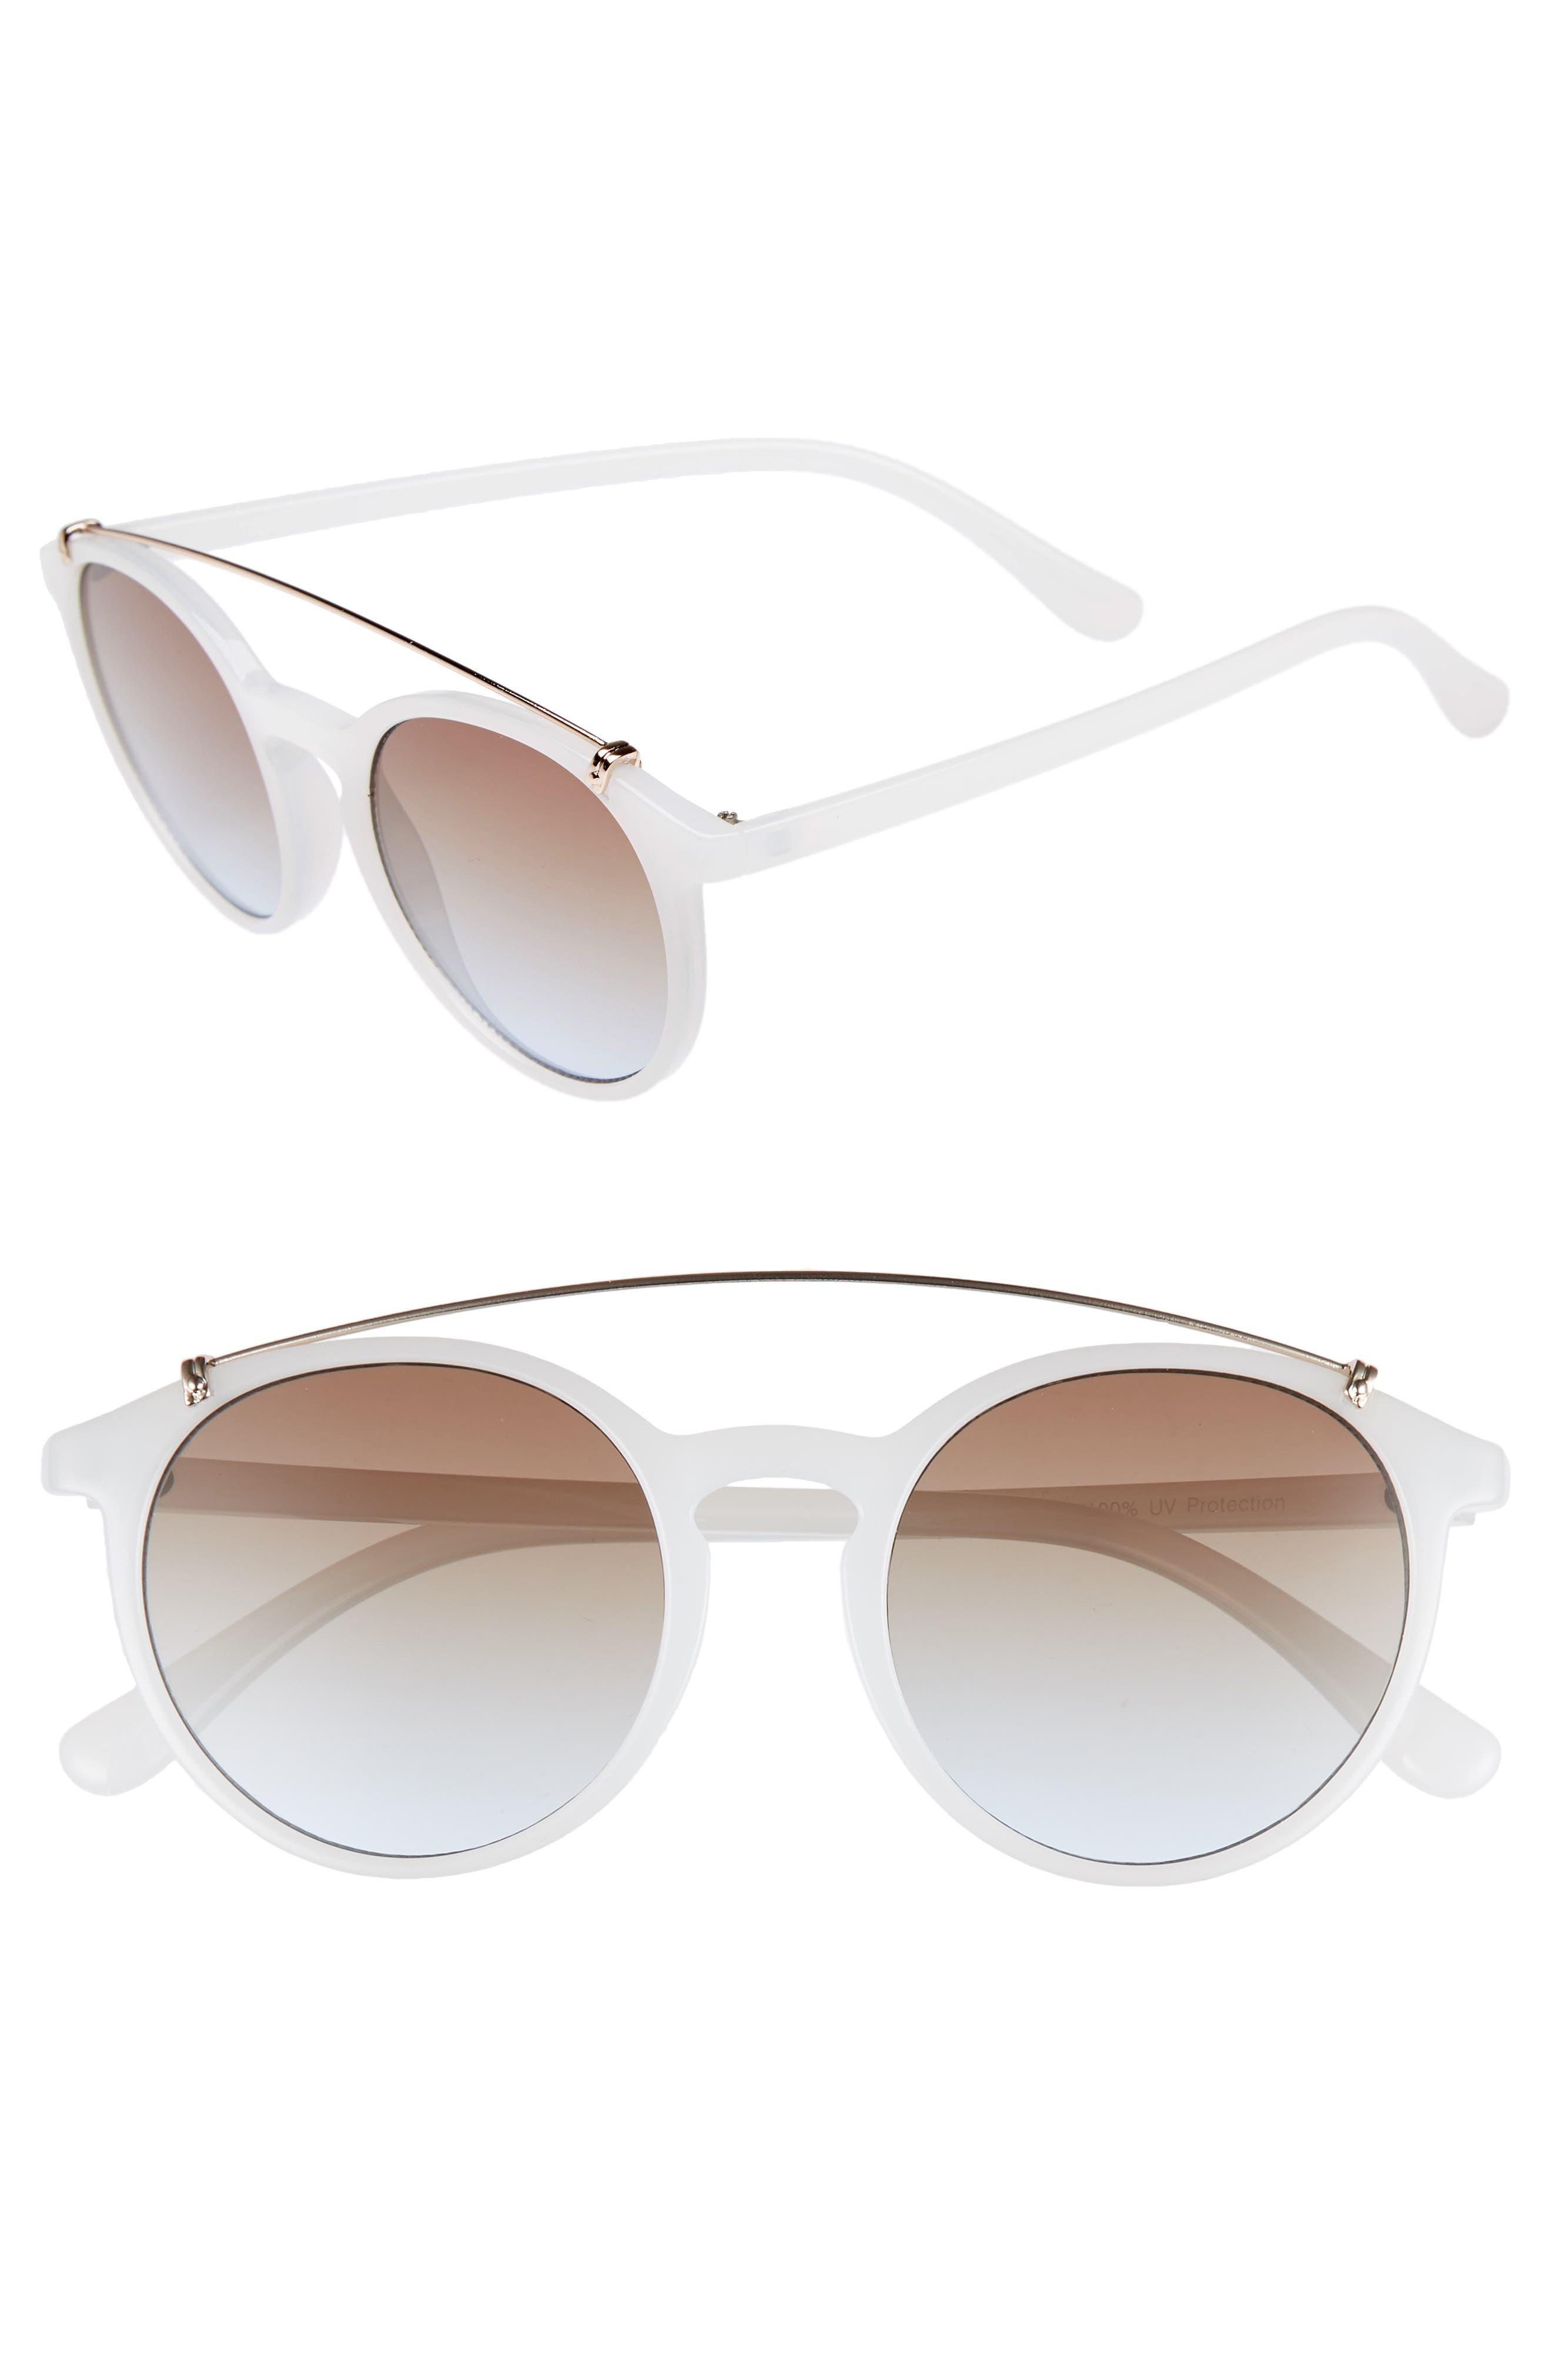 Round Aviator Sunglasses,                             Main thumbnail 1, color,                             MILKY WHITE/ GOLD